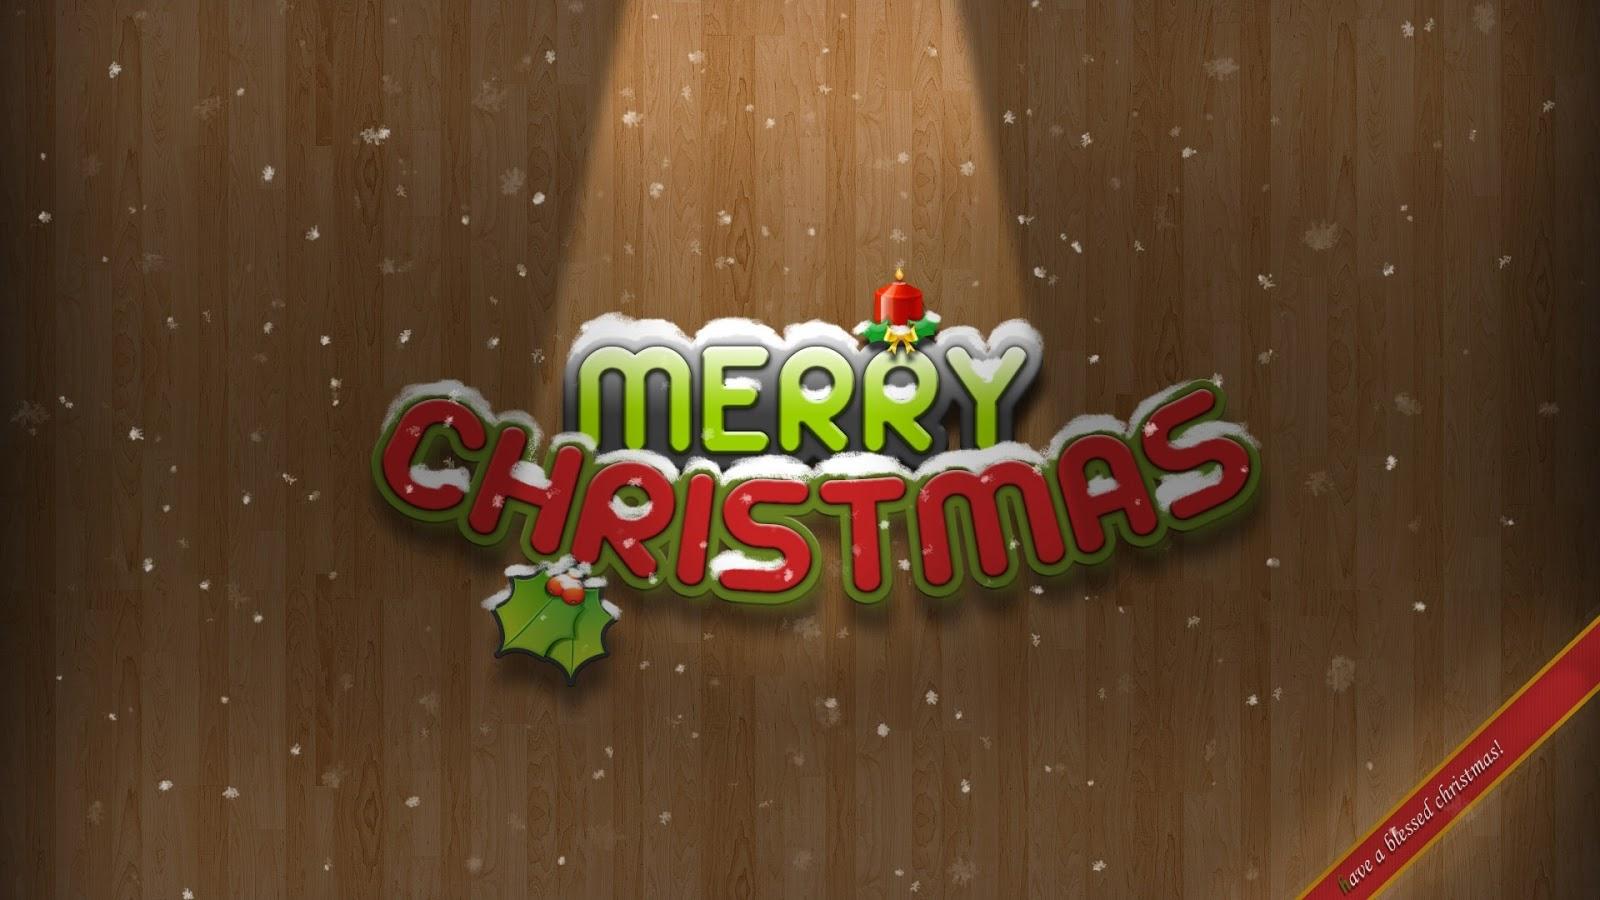 Christmas Hd Wallpapers 1080p.Christmas Hd Wallpapers 1080p